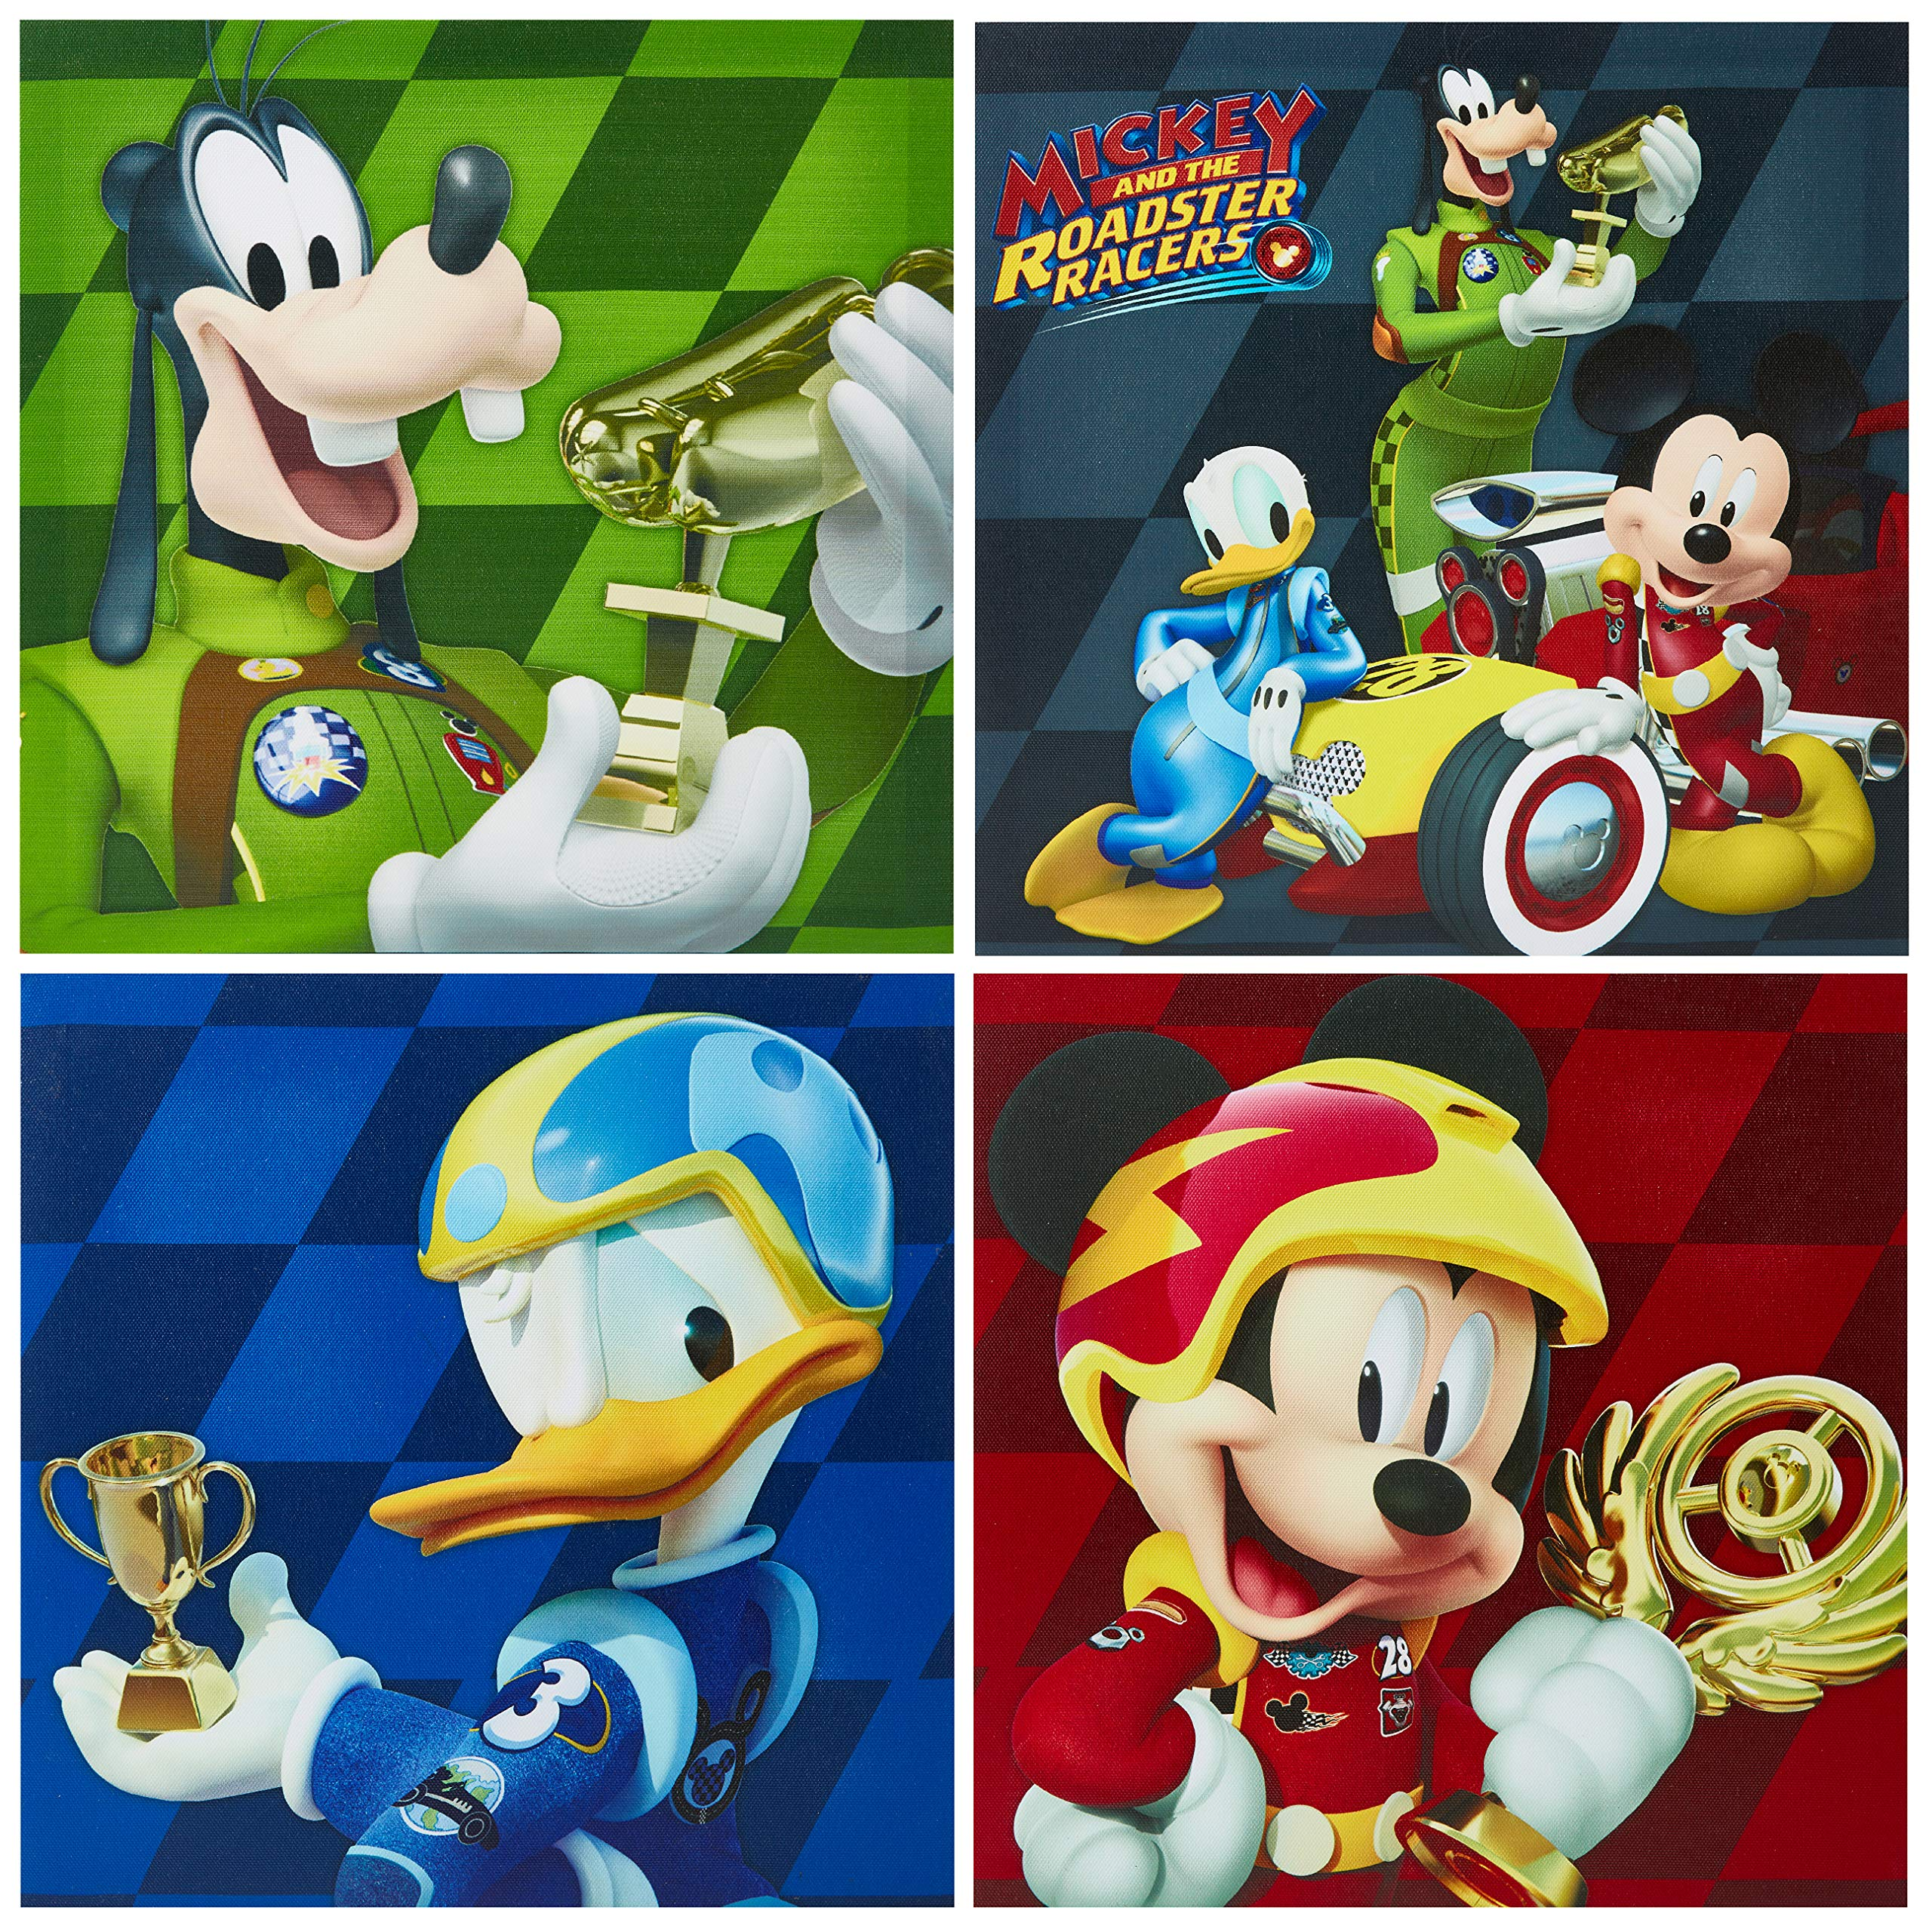 Disney NK320642 Mickey Mouse Wall Art (4 Piece), Multicolor